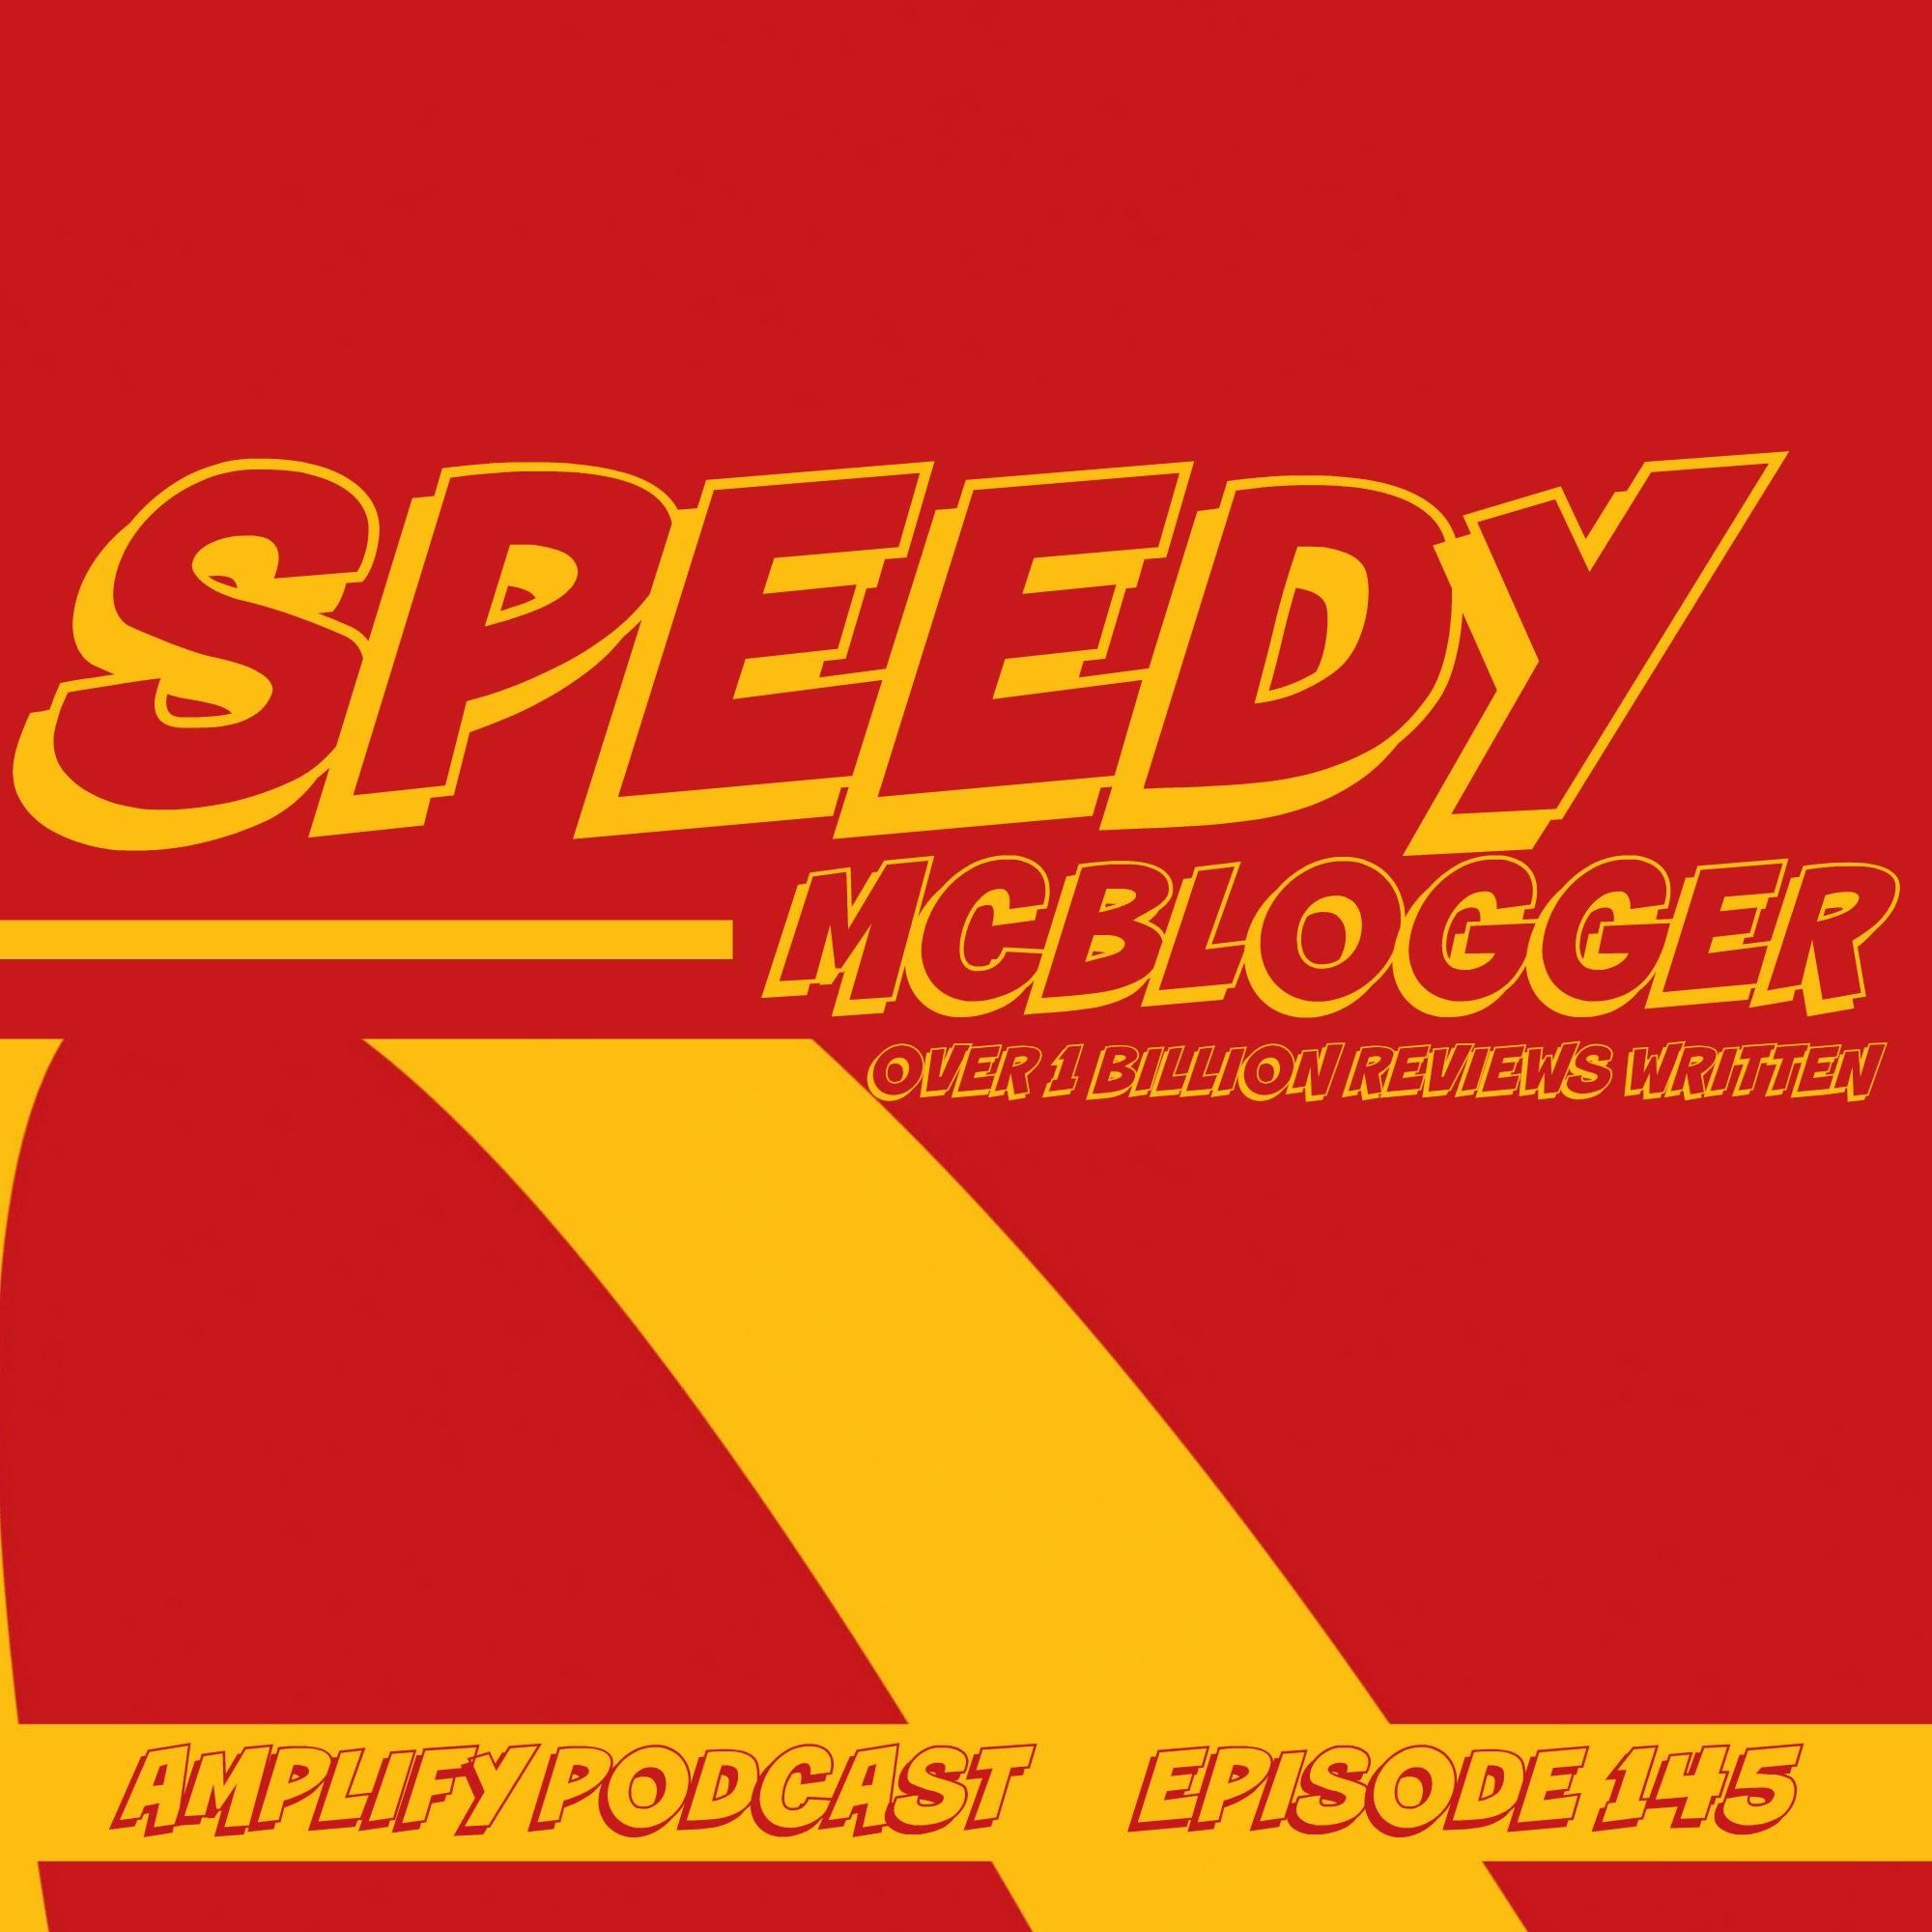 Speedy McBlogger